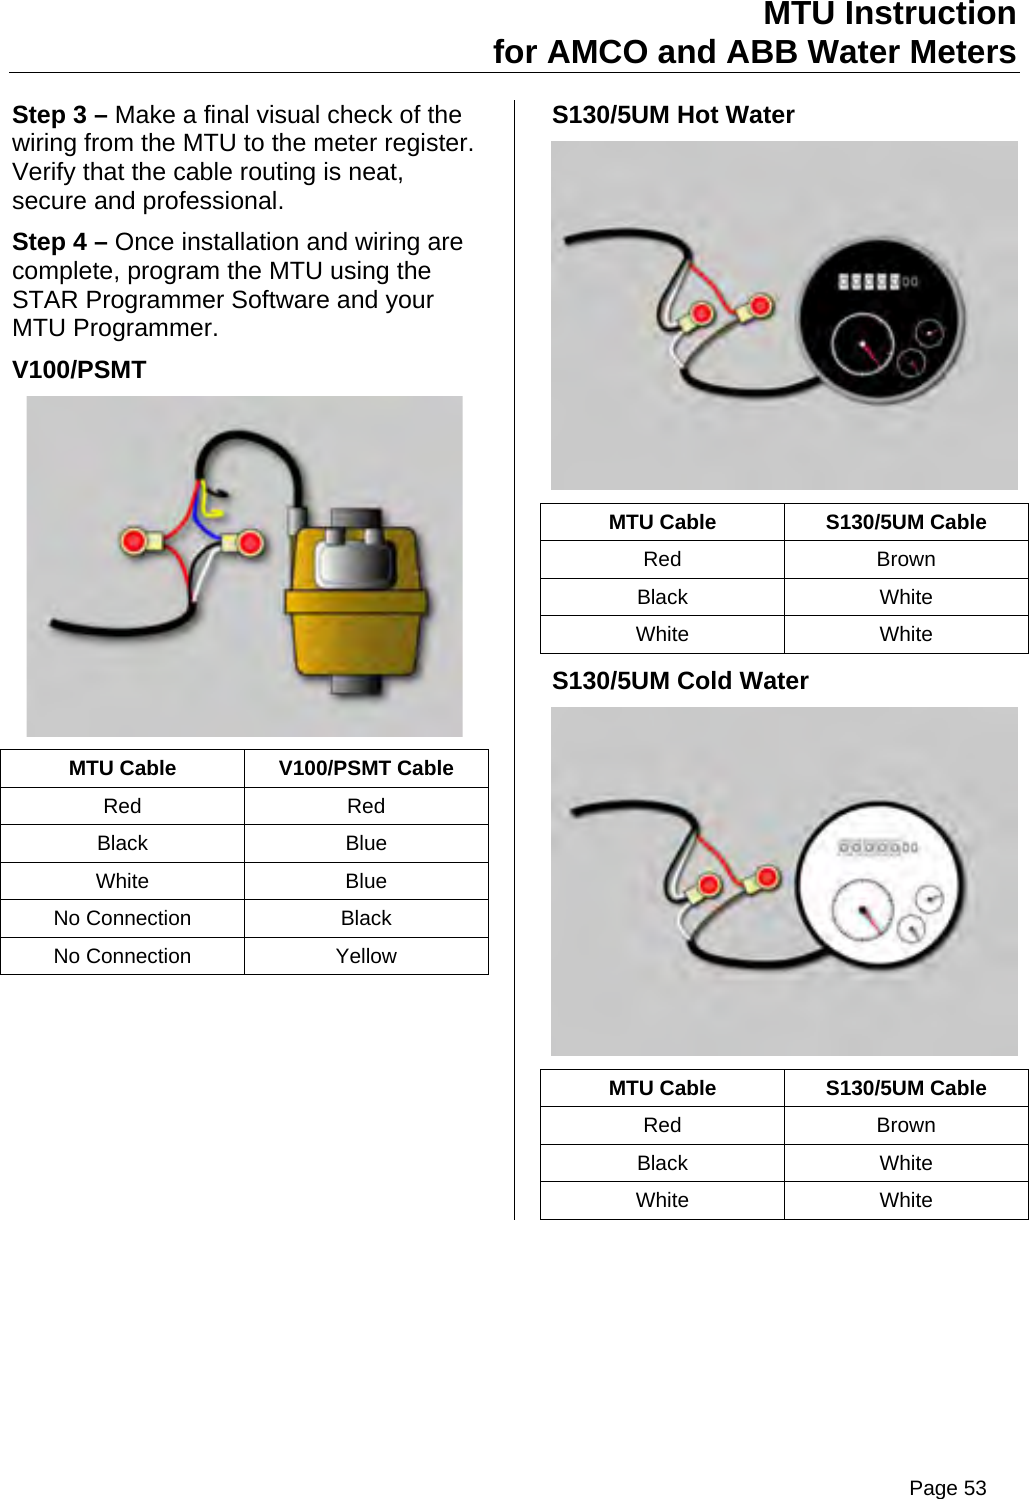 Aclara Technologies 09013 TRANSMITTER FOR METER READING User Manual on